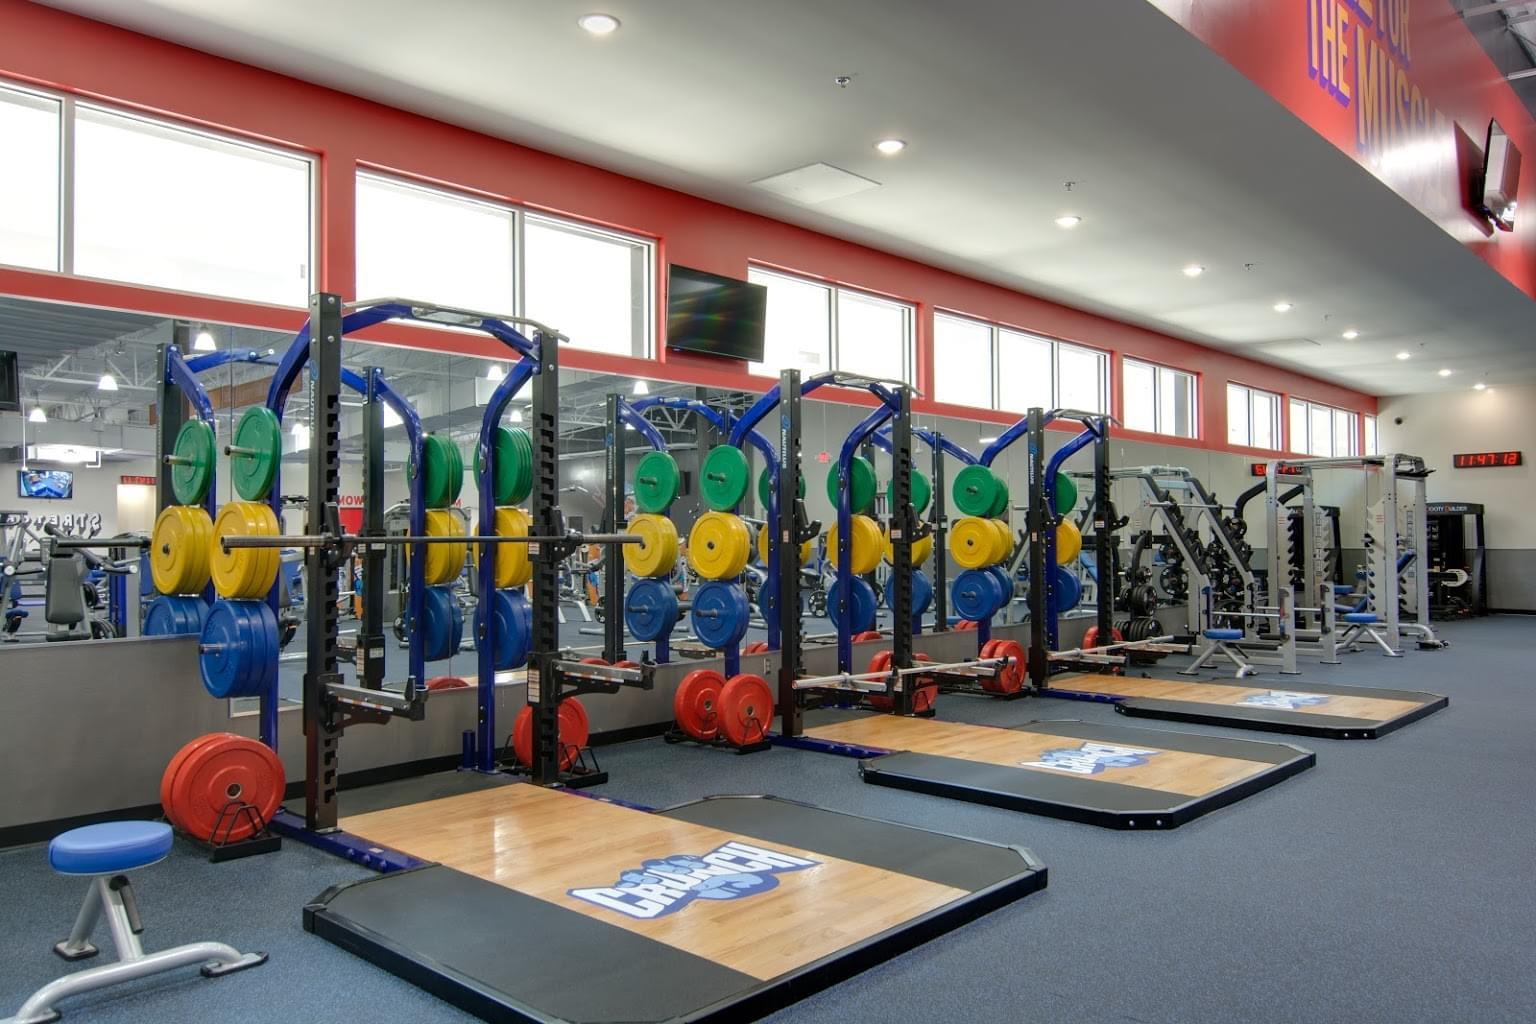 squat racks at Crunch Fitness Midlothian Gym and Health Club in Richmond, VA